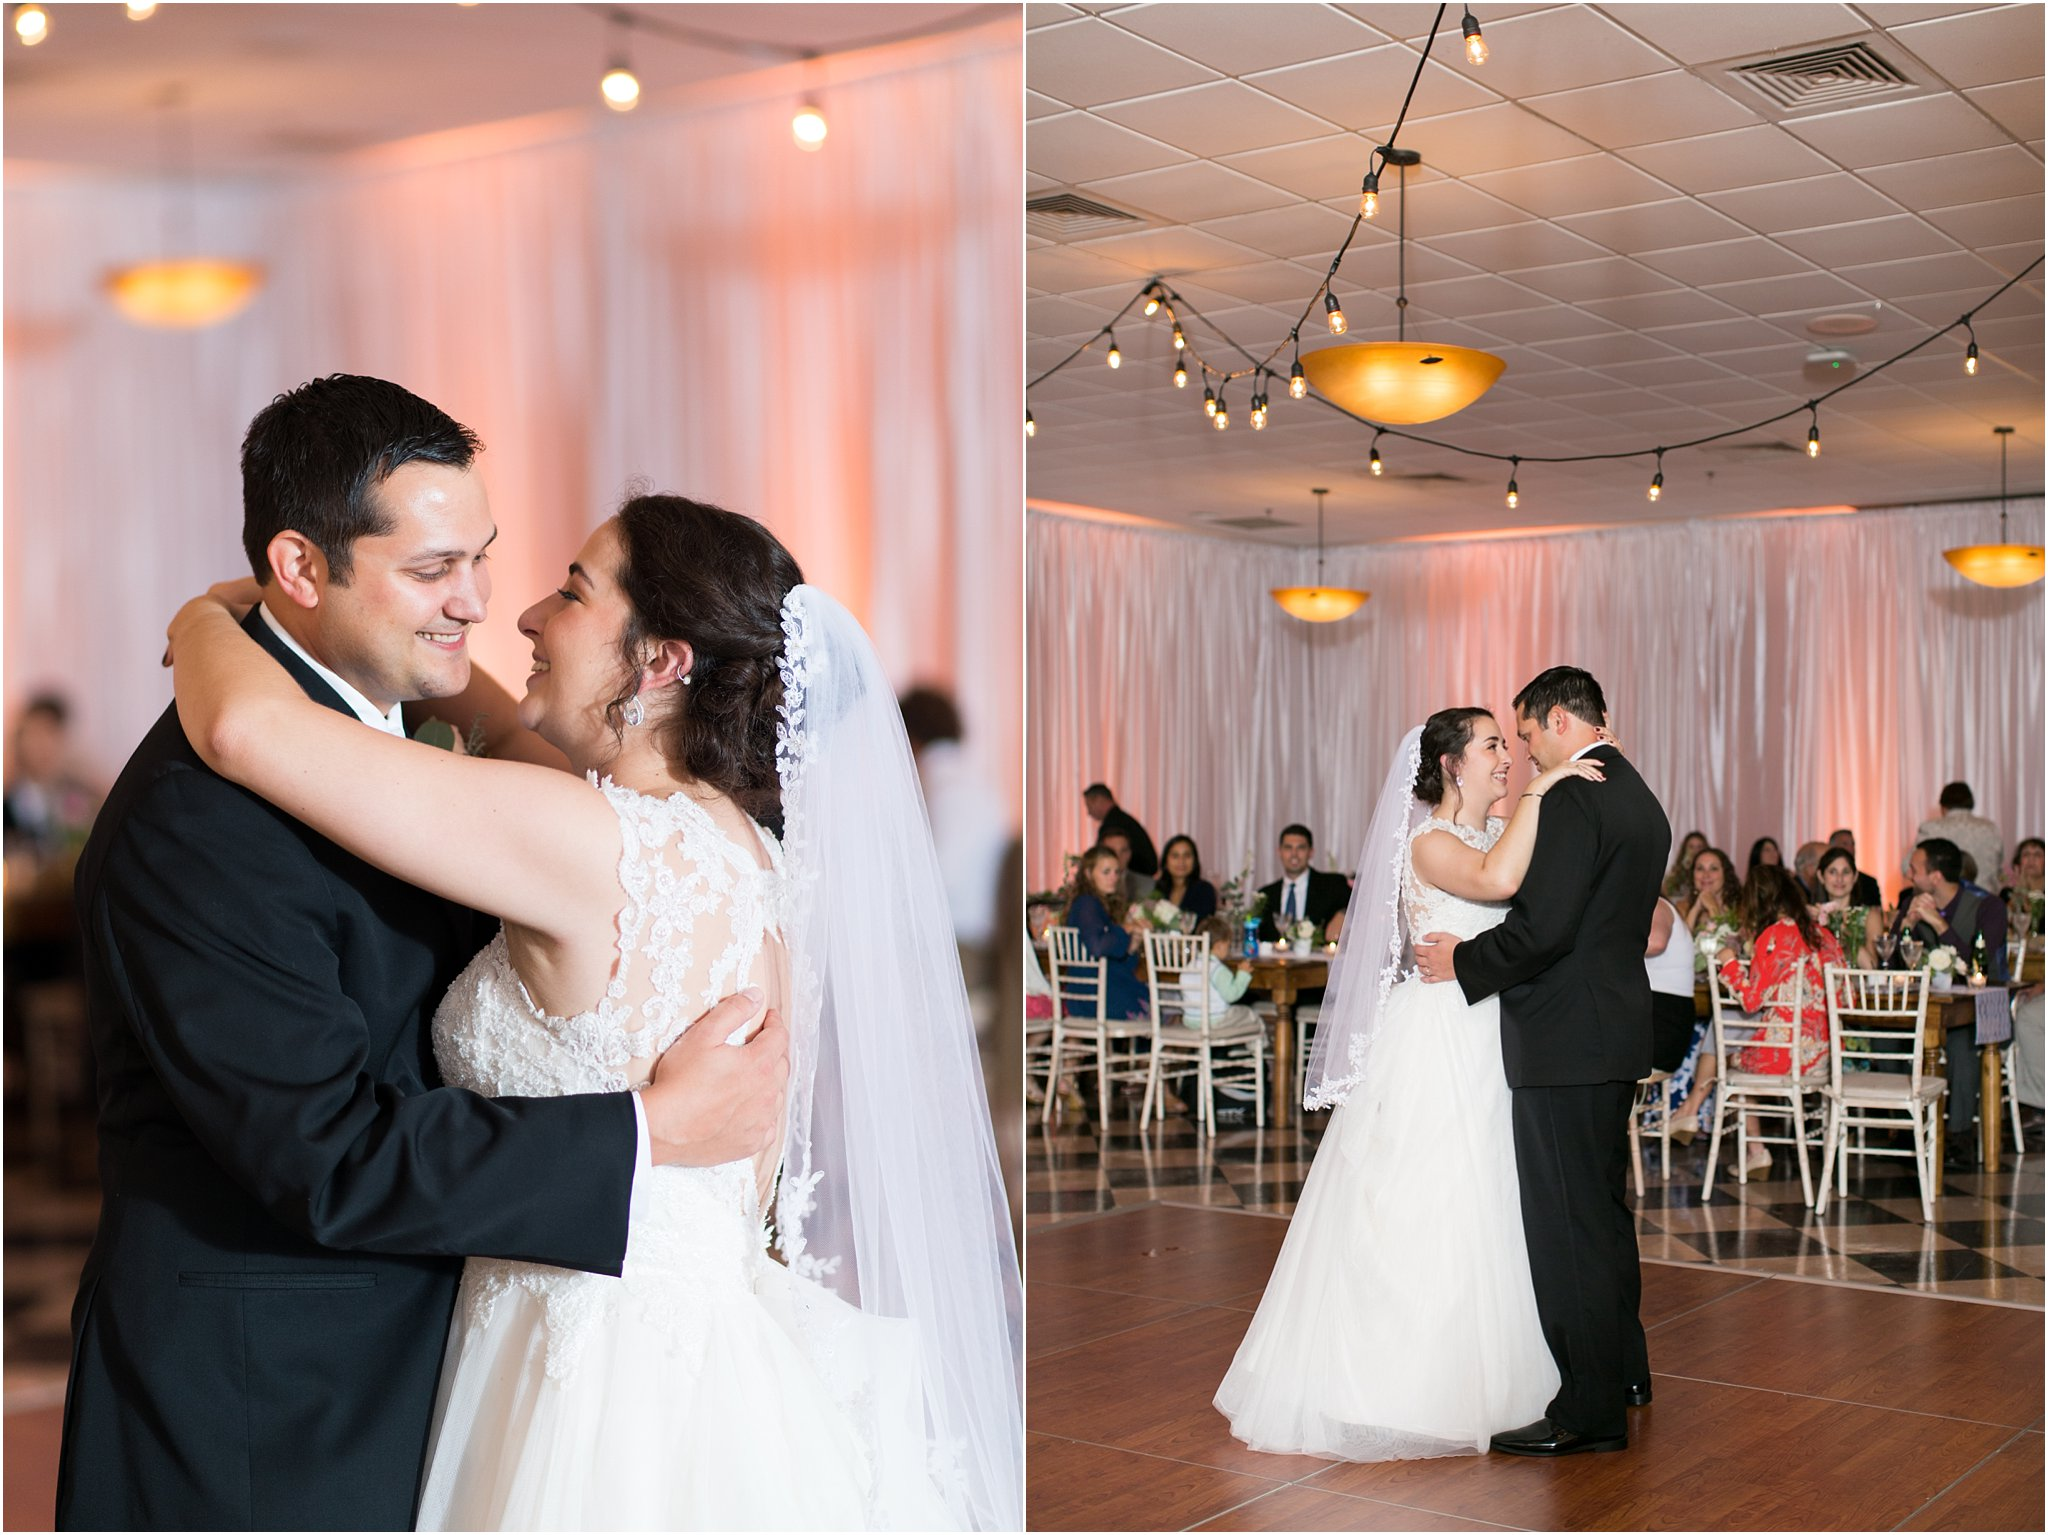 jessica_ryan_photography_virginia_wedding_photographer_wedding_hurricane_norfolk_botanical_gardens_hurricane_matthew_wedding_3627